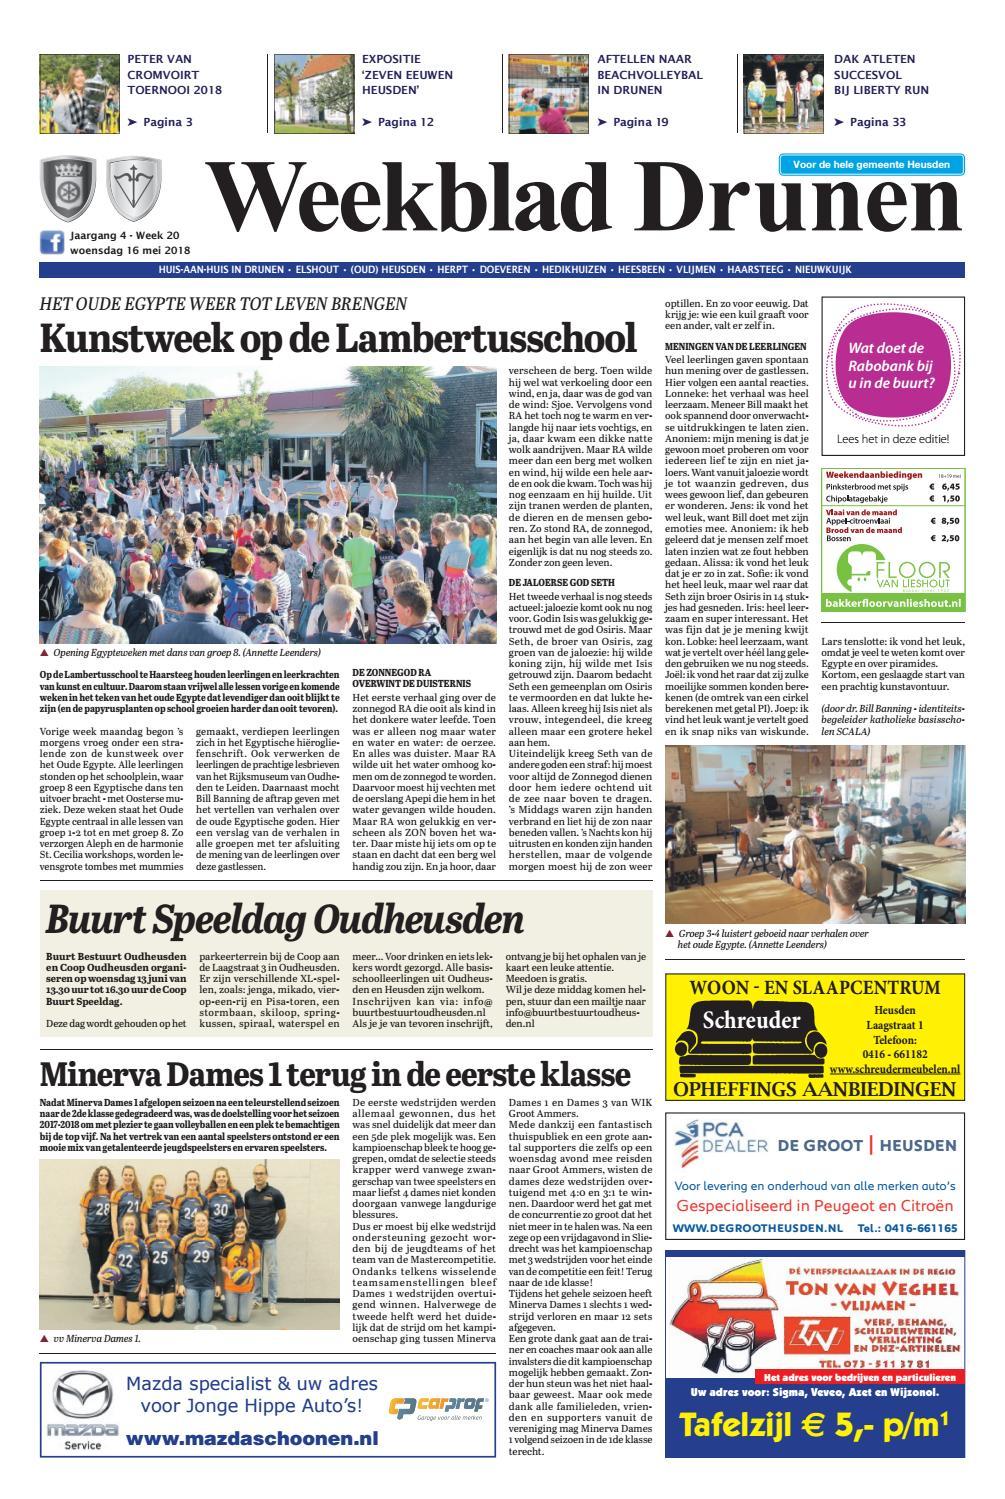 bdb5cab0b53 Weekblad Drunen 16-05-2018 by Uitgeverij Em de Jong - issuu